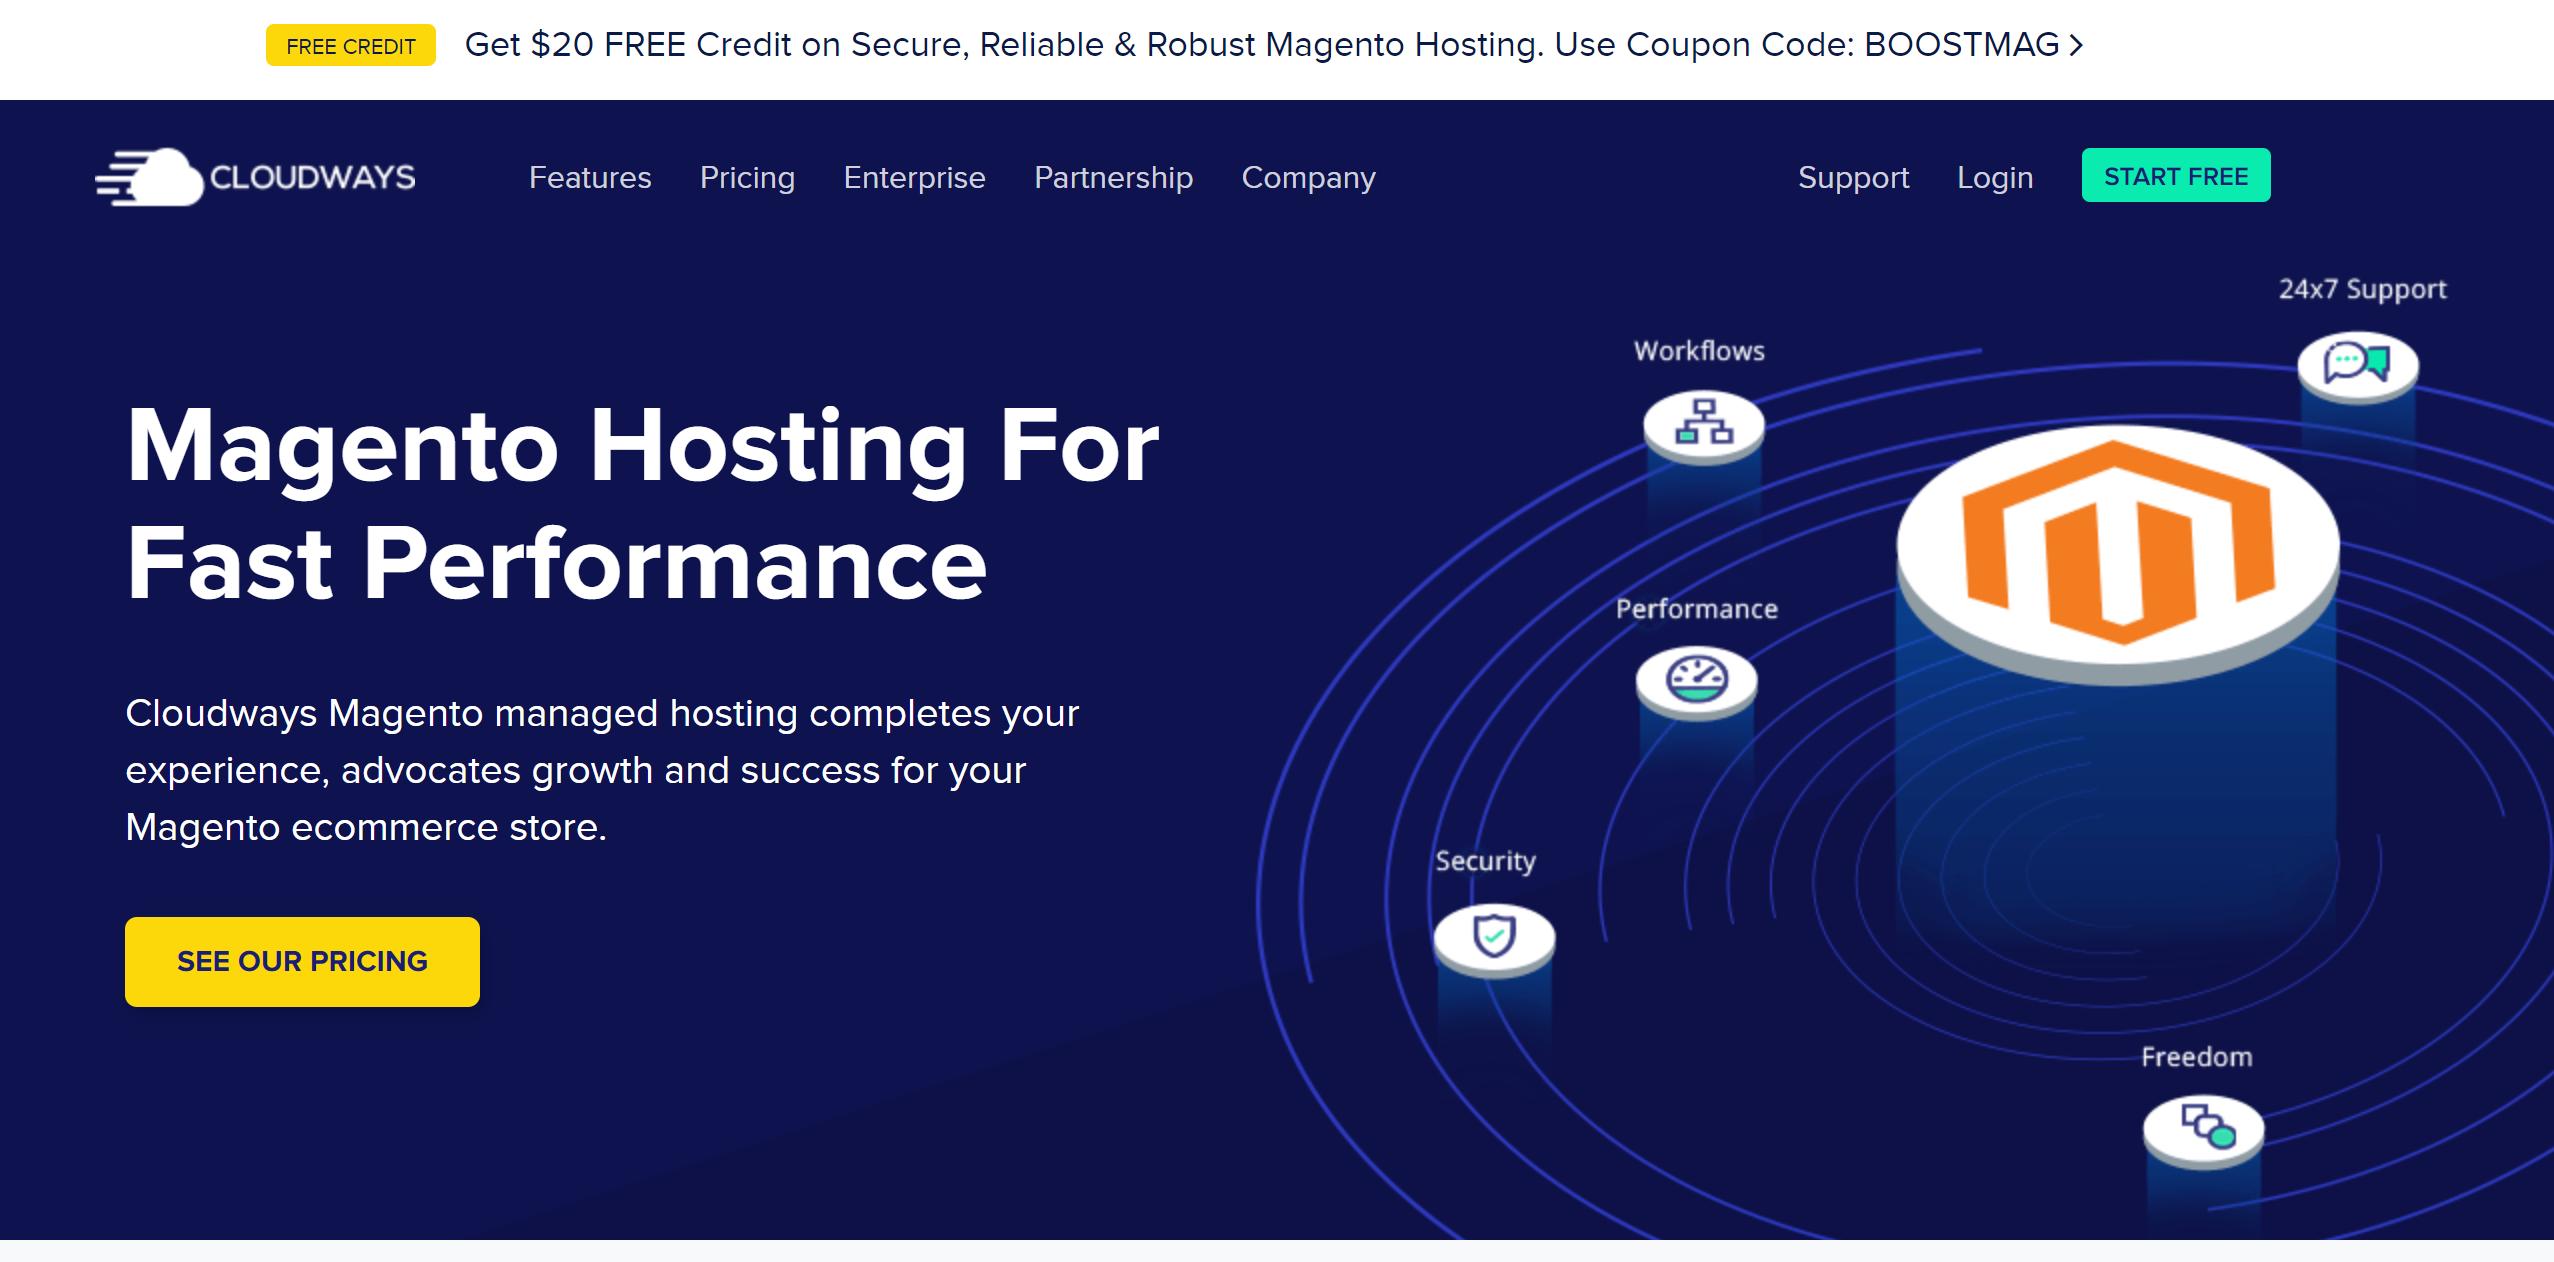 Cloudways magento hosting